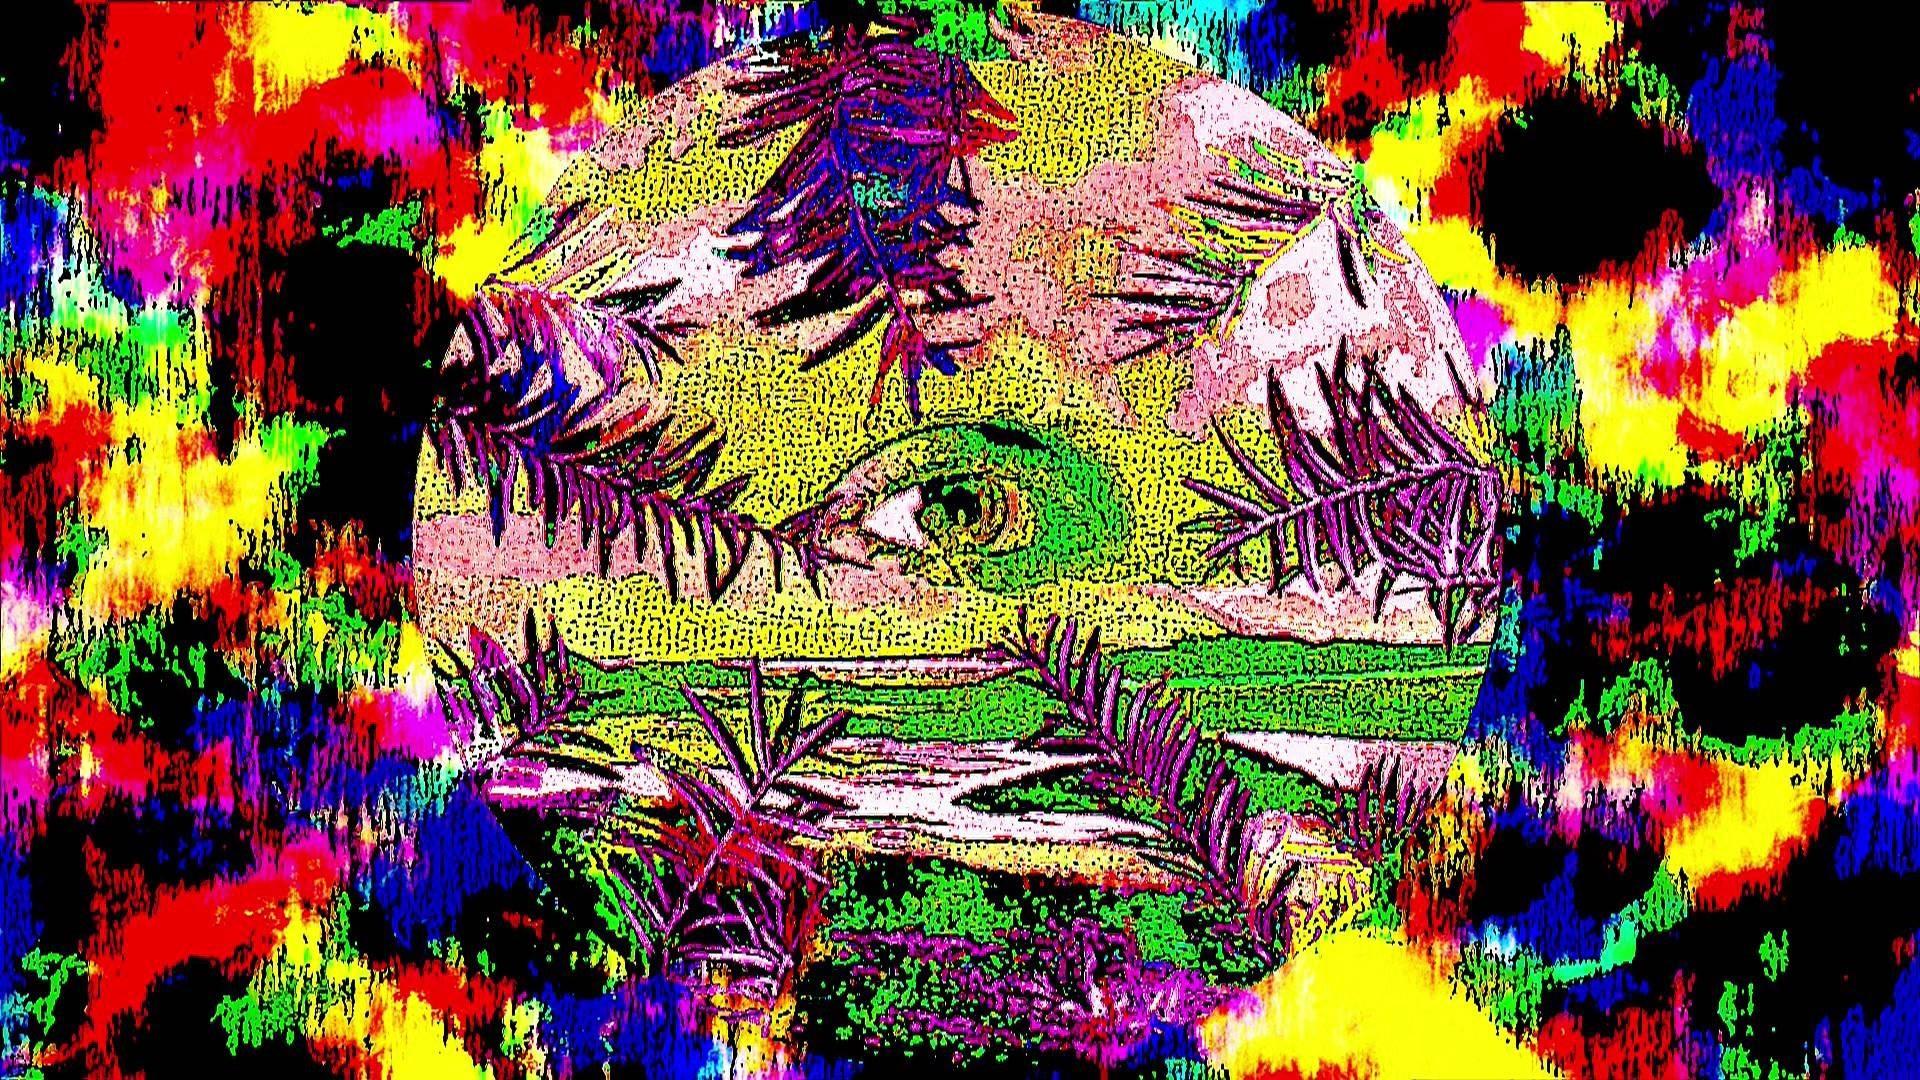 acid trip hd wallpaper | ololoshka | Pinterest | Acid trip, Hd wallpaper  and Wallpaper